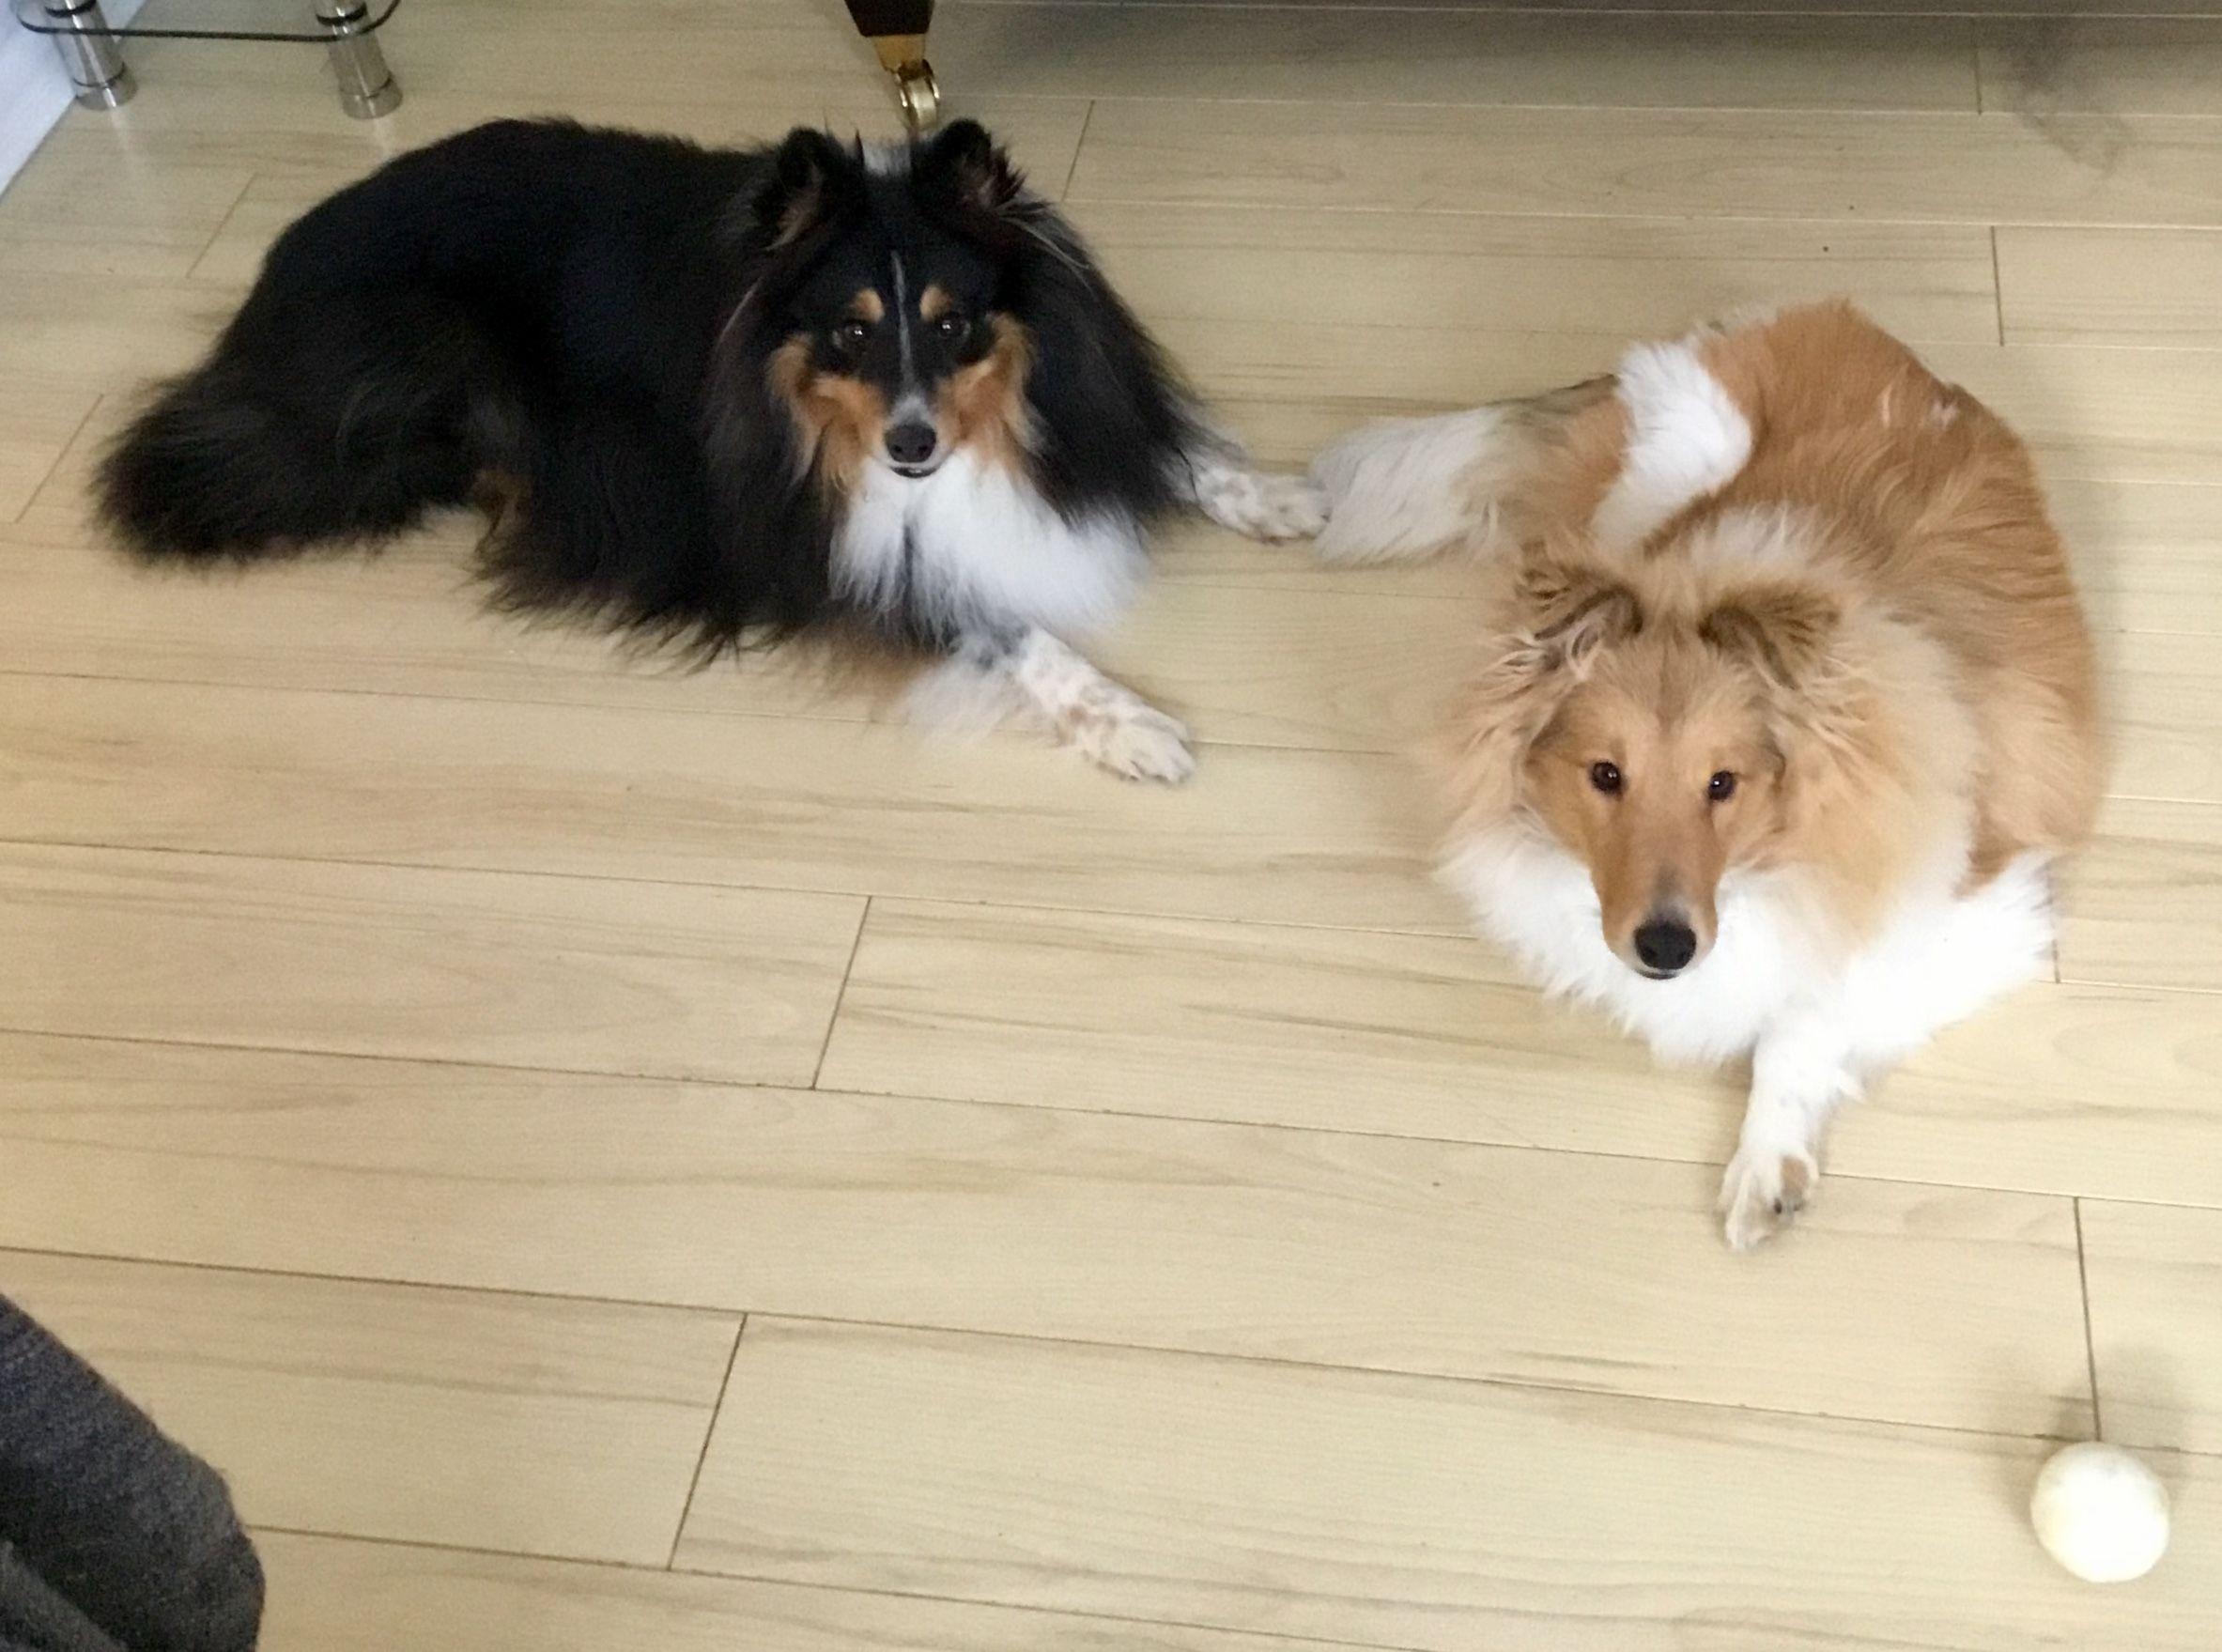 Reveille Ix On Rough Collie Collie Dog Dogs Puppies